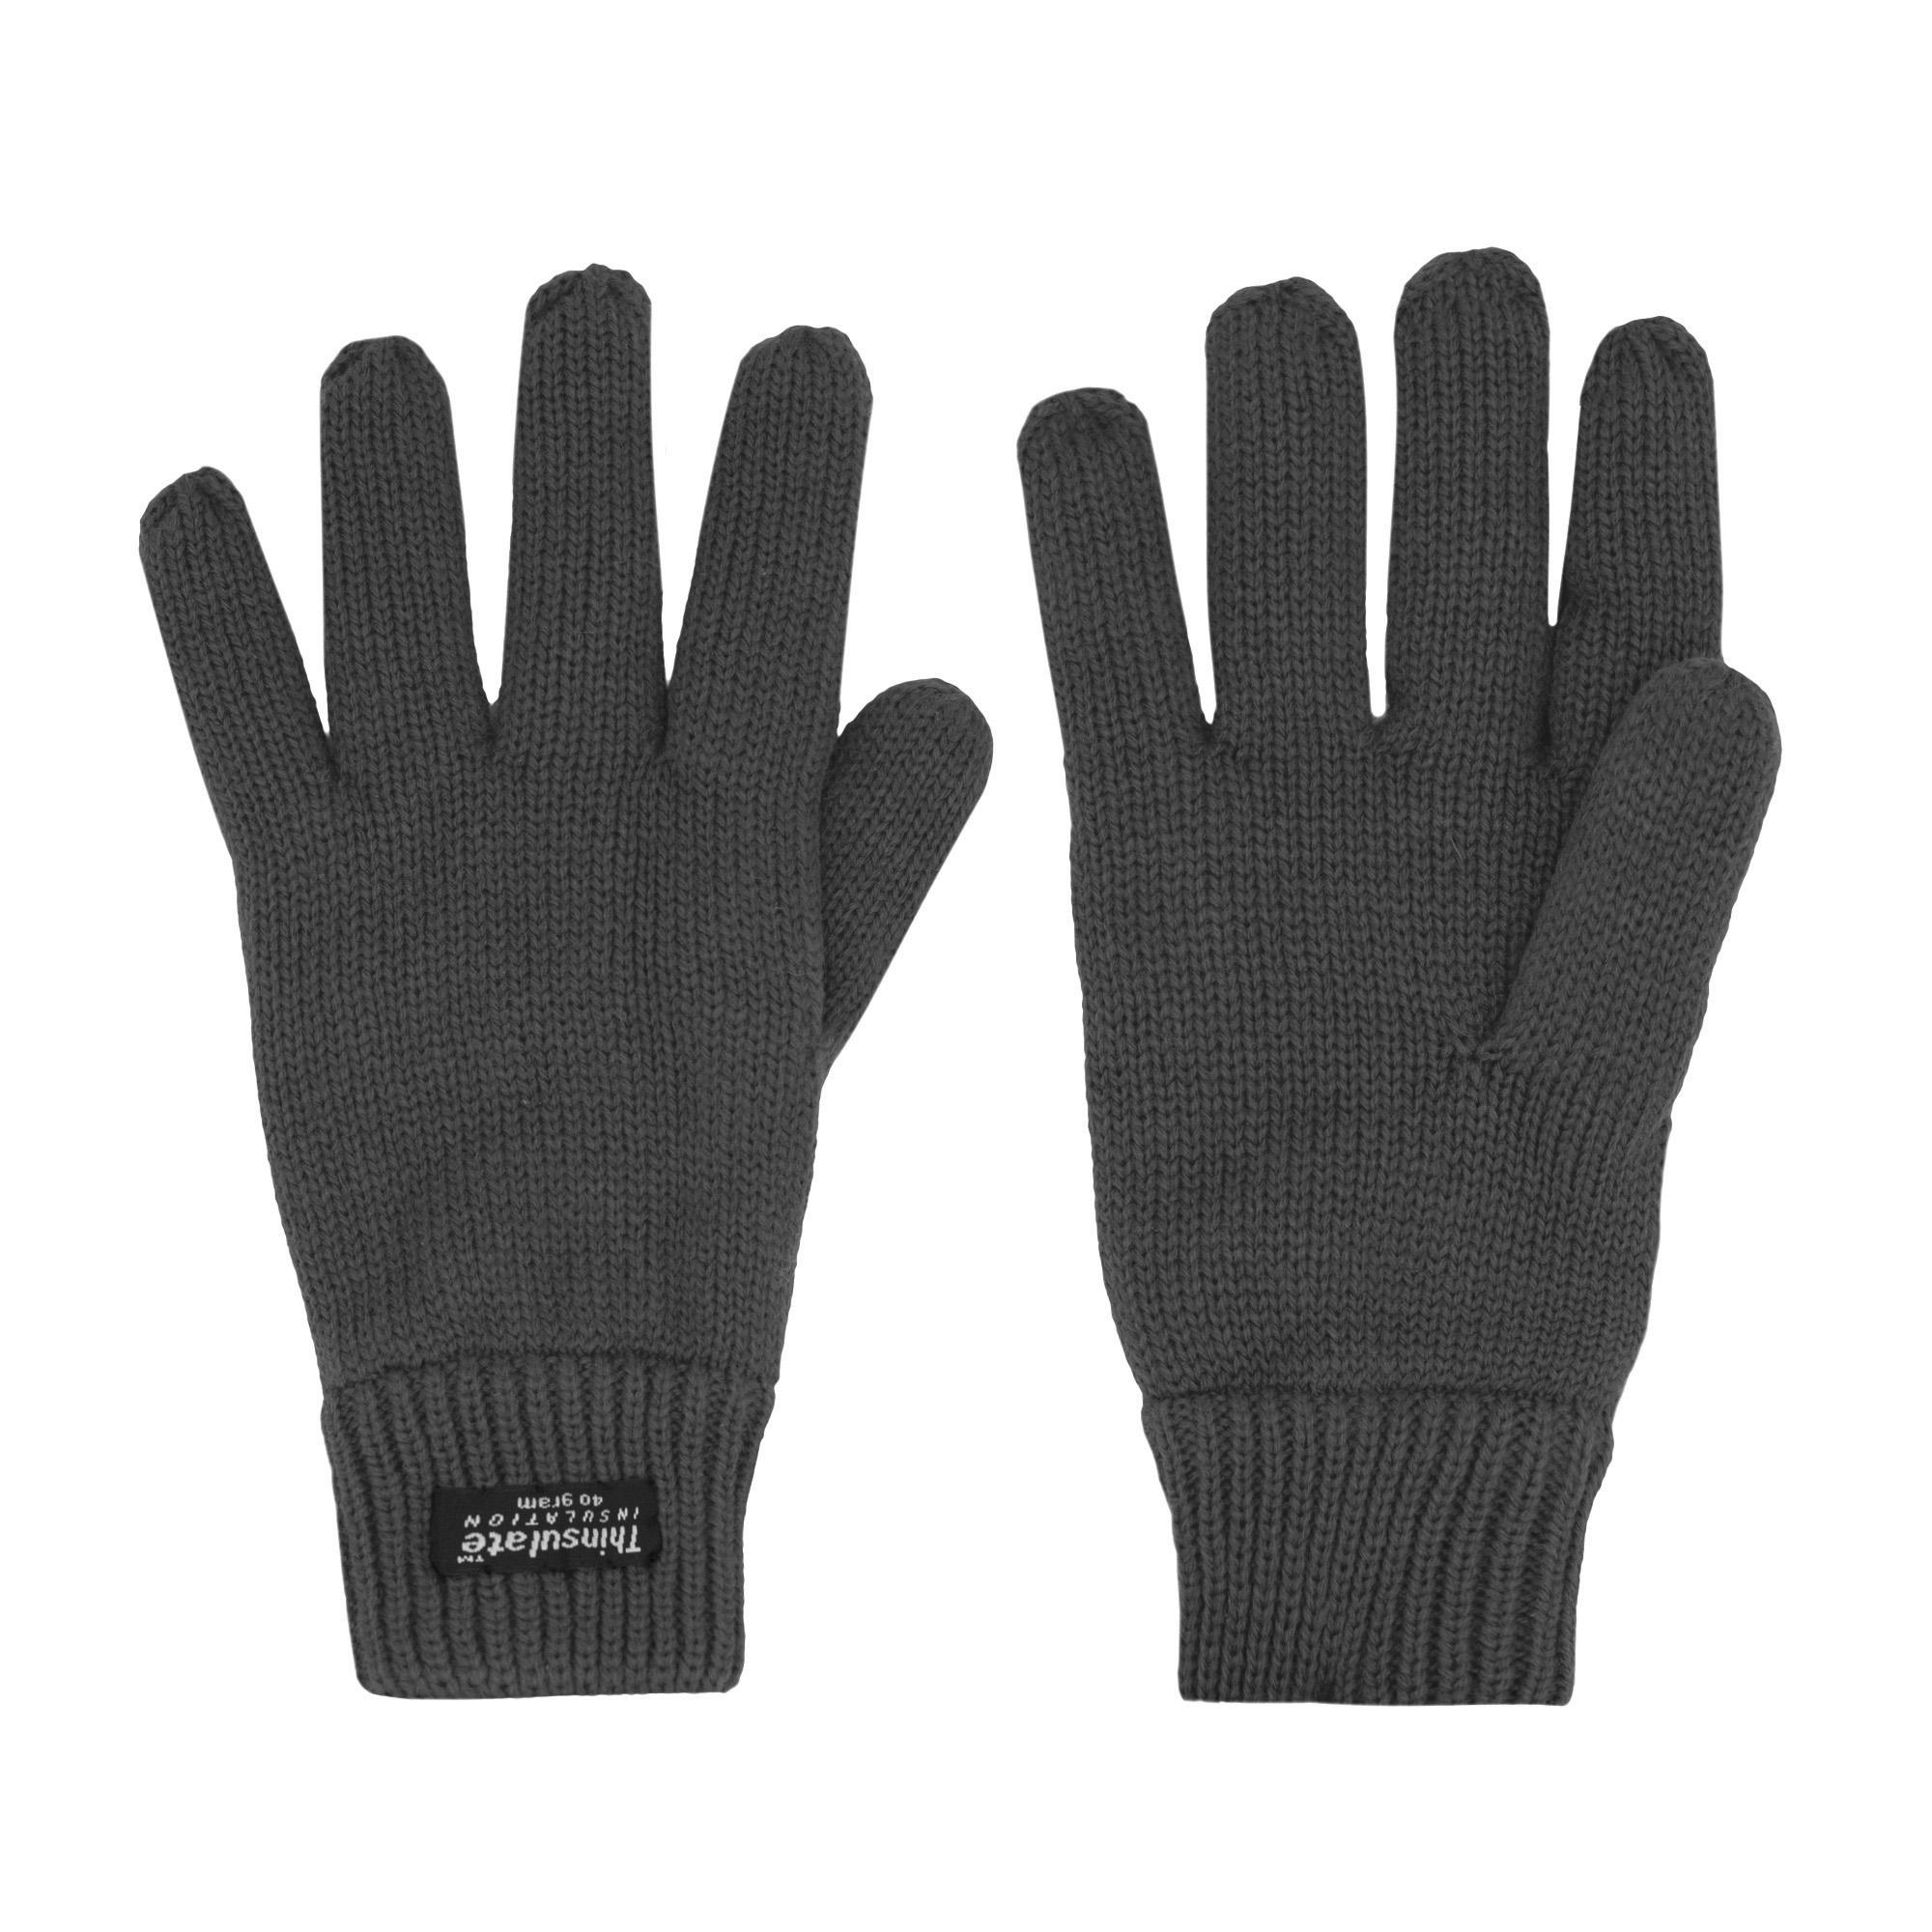 دستکش بافتنی زنانه آردن کد D 06 G